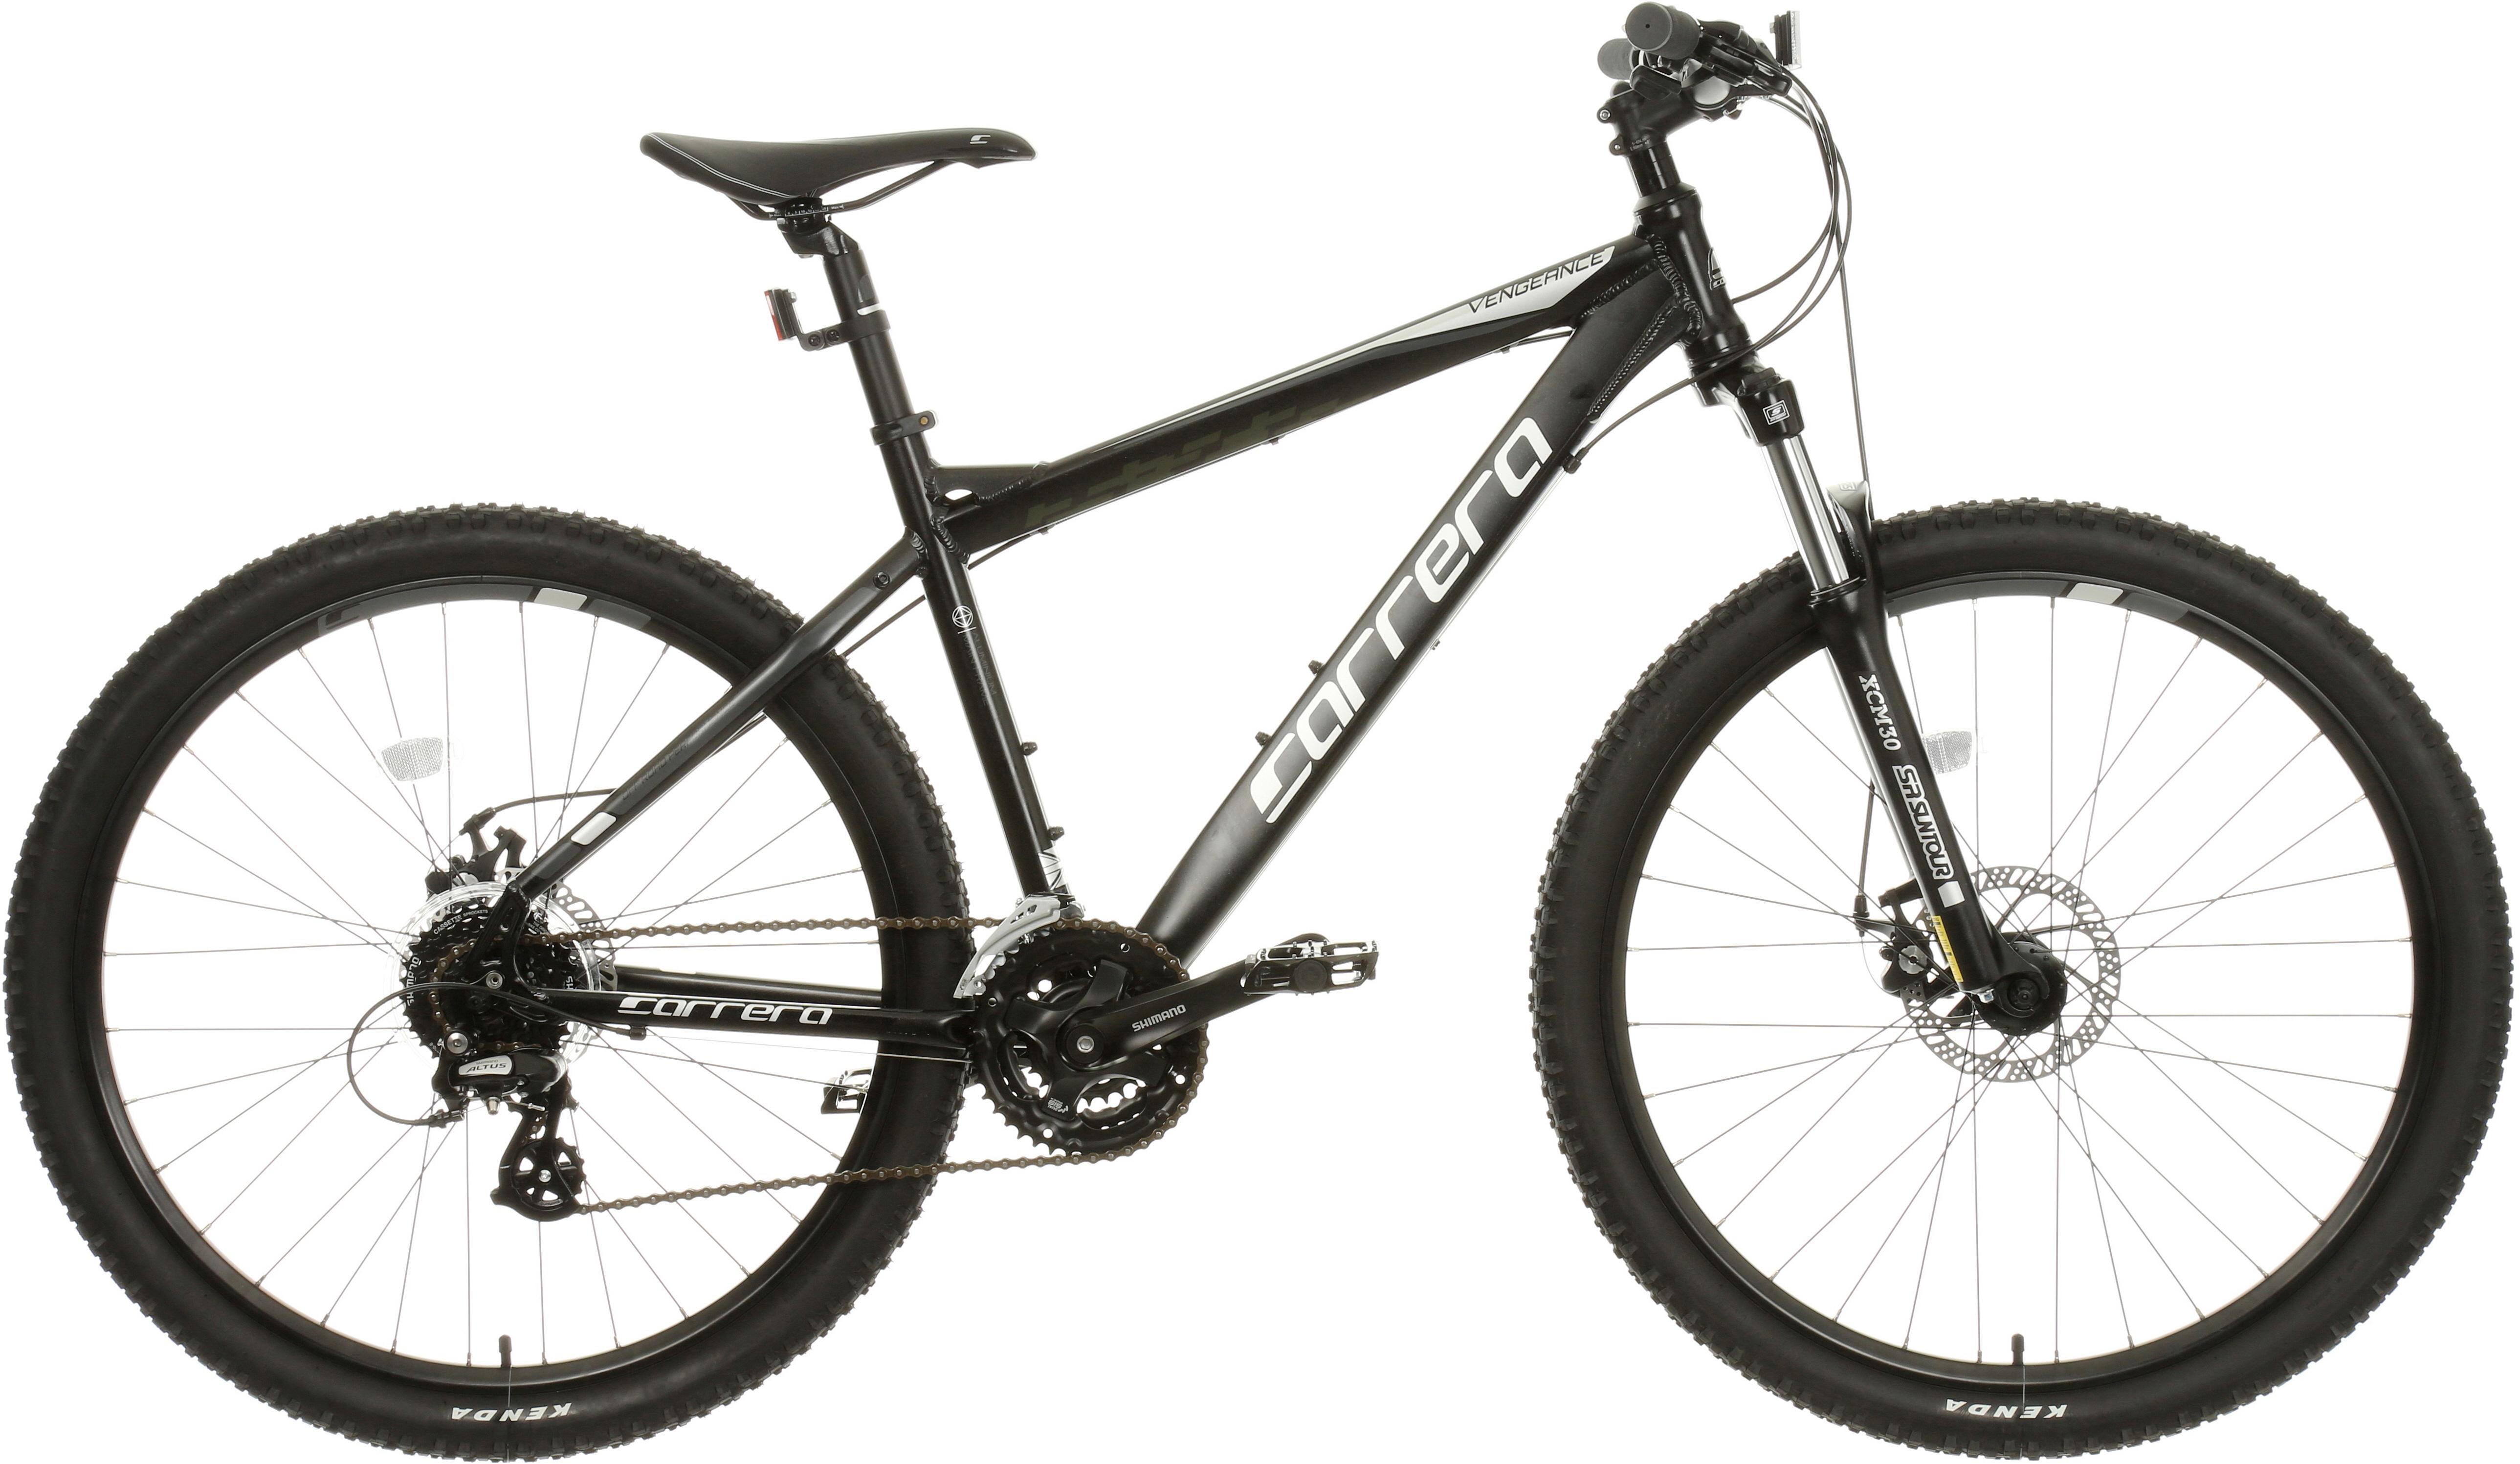 Carrera Vengeance Mens Mountain Bike - Black, S